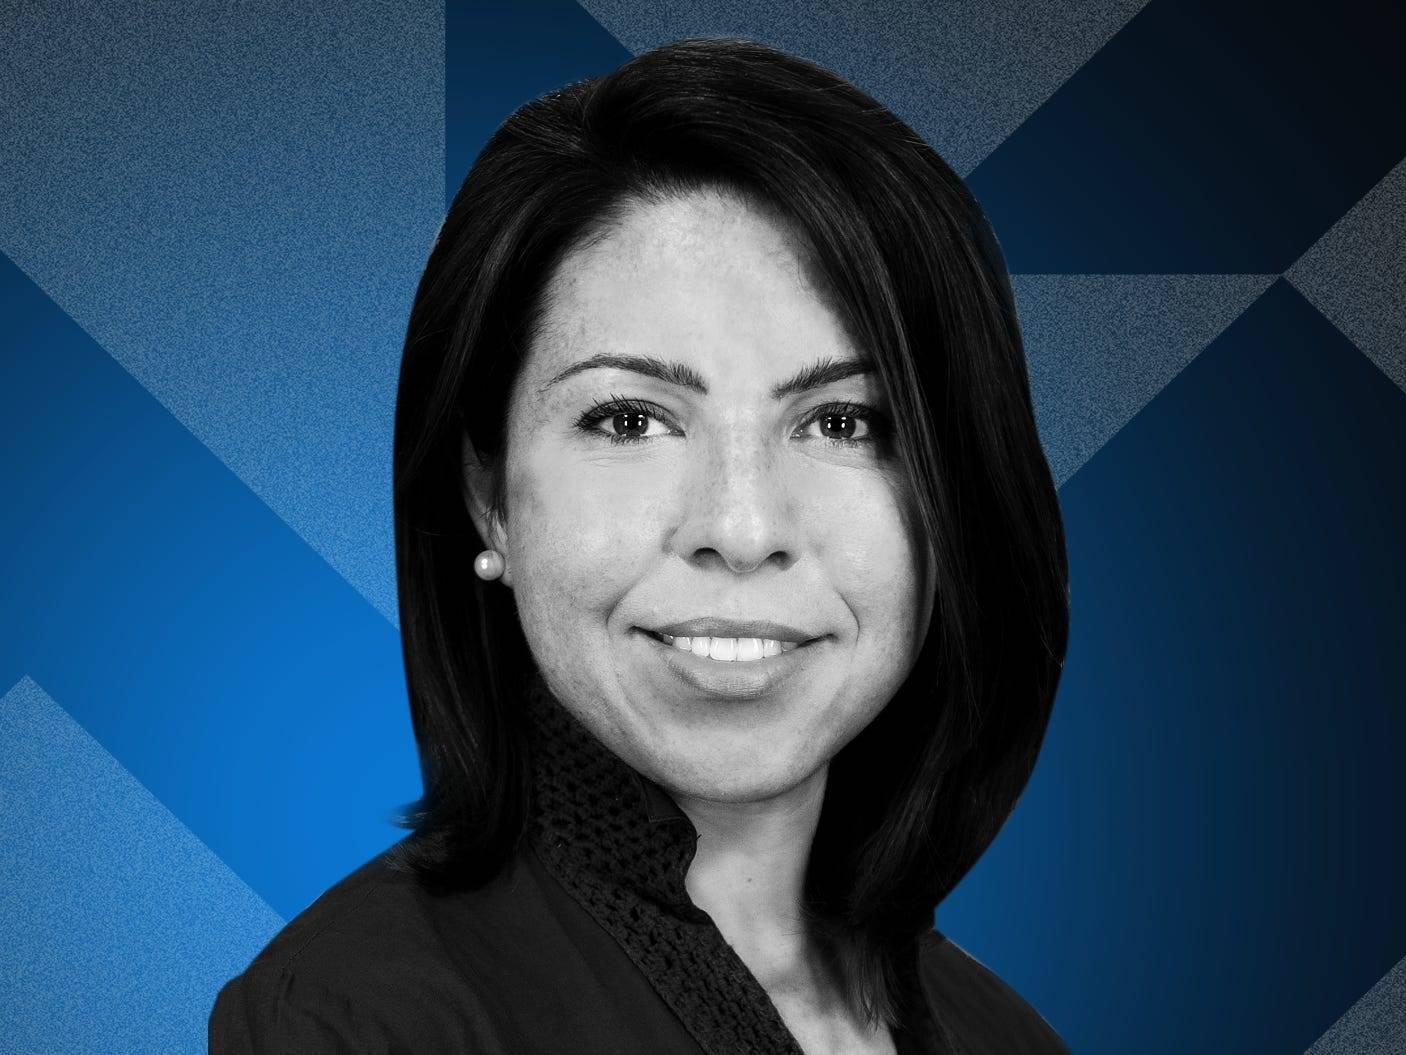 Jennifer Jordan to speak at the Business Insider Global Trends Festival 2020 on leadership in the digital age